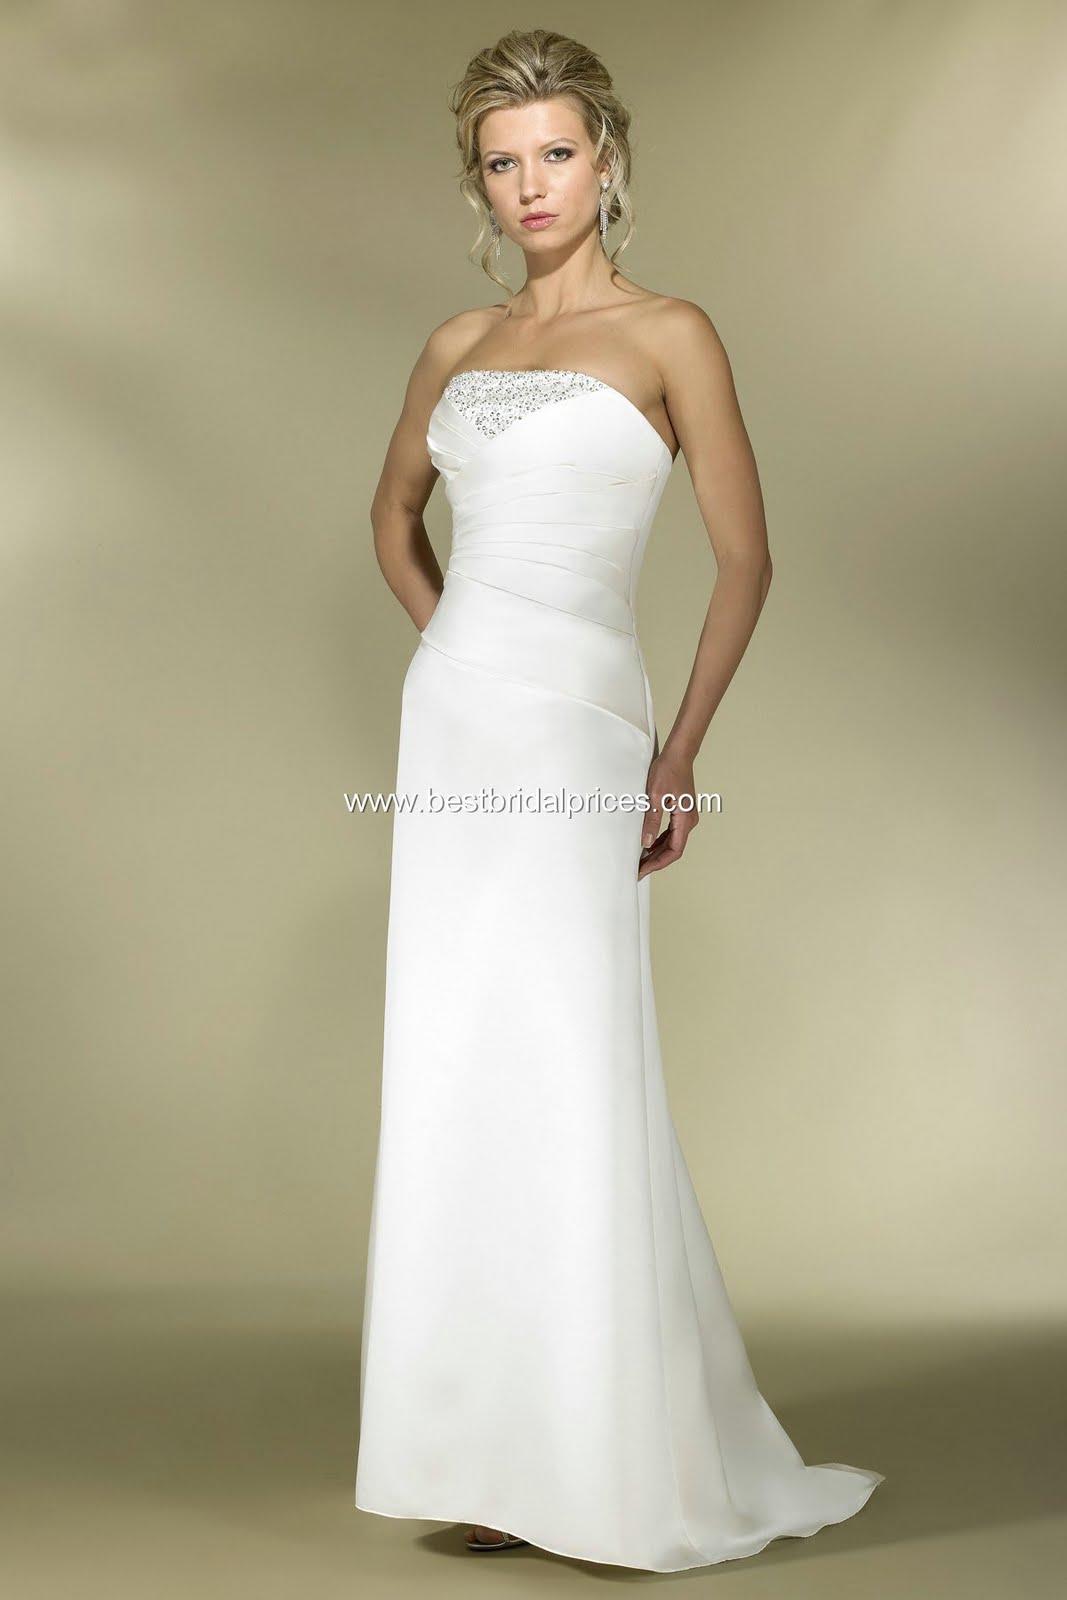 plain silk wedding gowns plain wedding dresses Ivory Informal Wedding Dresses Sheath V Neck Beaded Lace